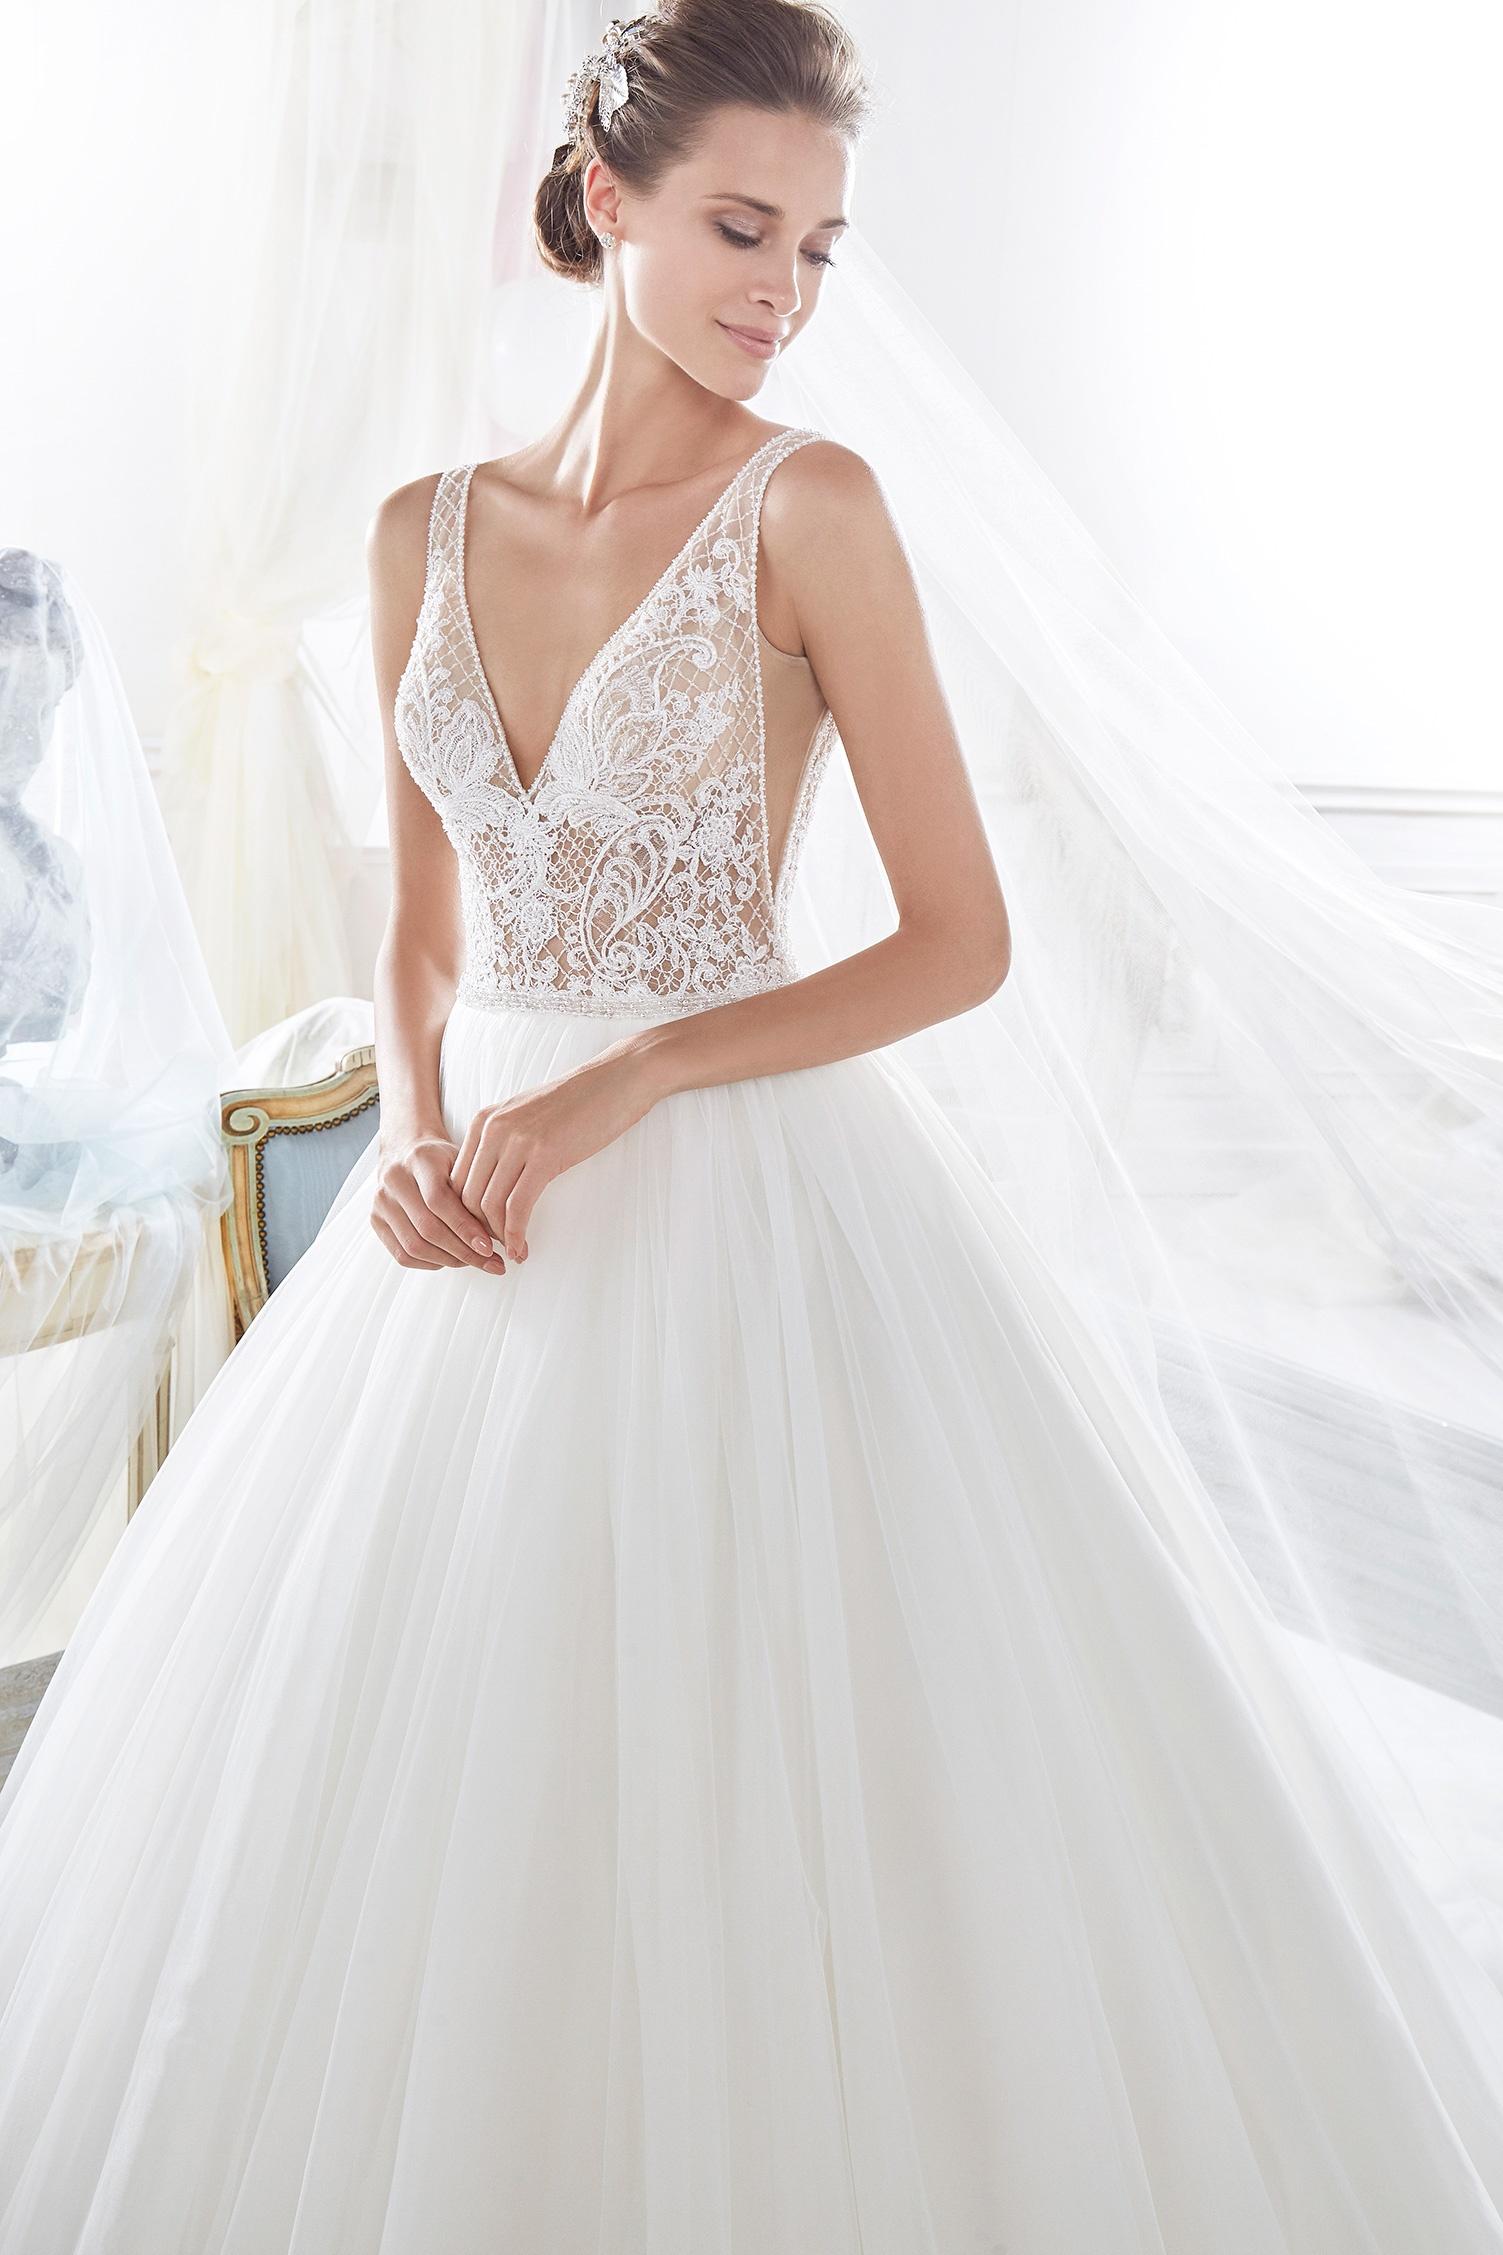 nicole-spose-NIAB18009-Nicole-moda-sposa-2018-384.jpg